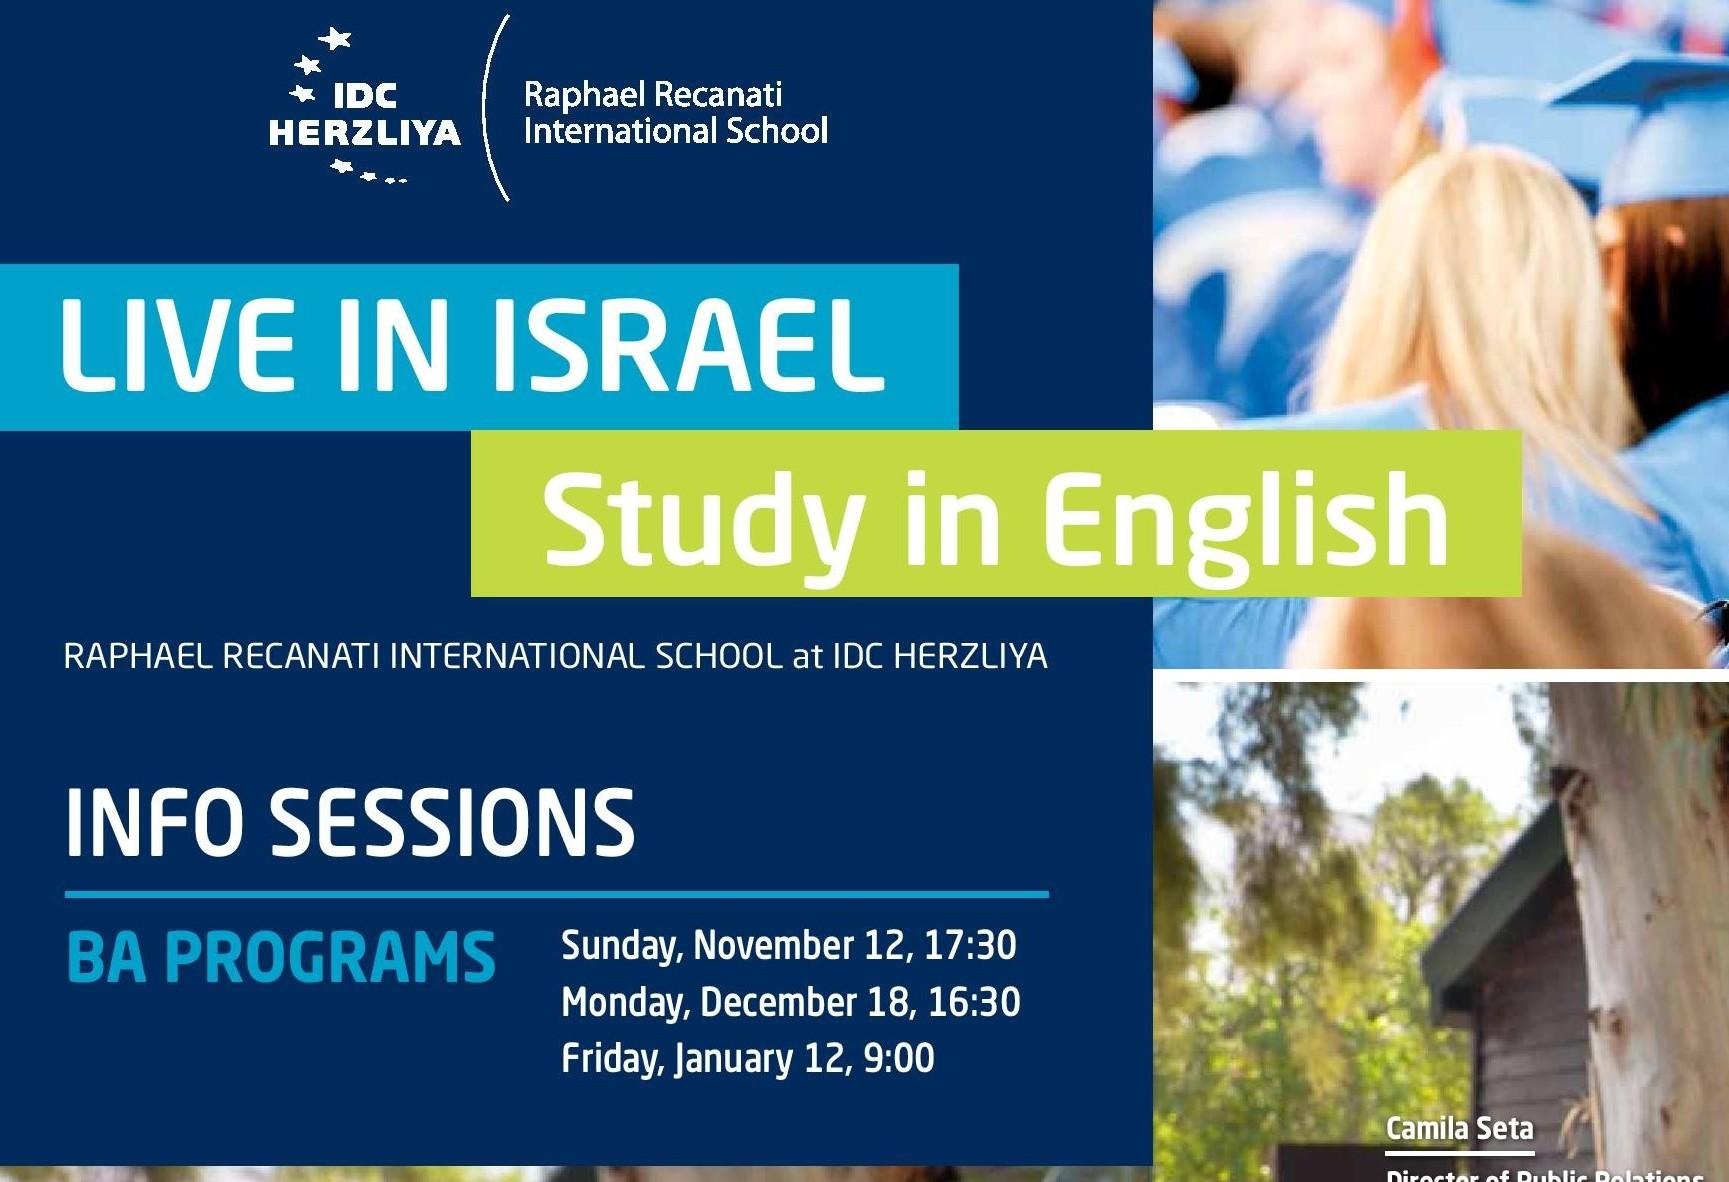 IDC Herzliya Open Houses in Israel